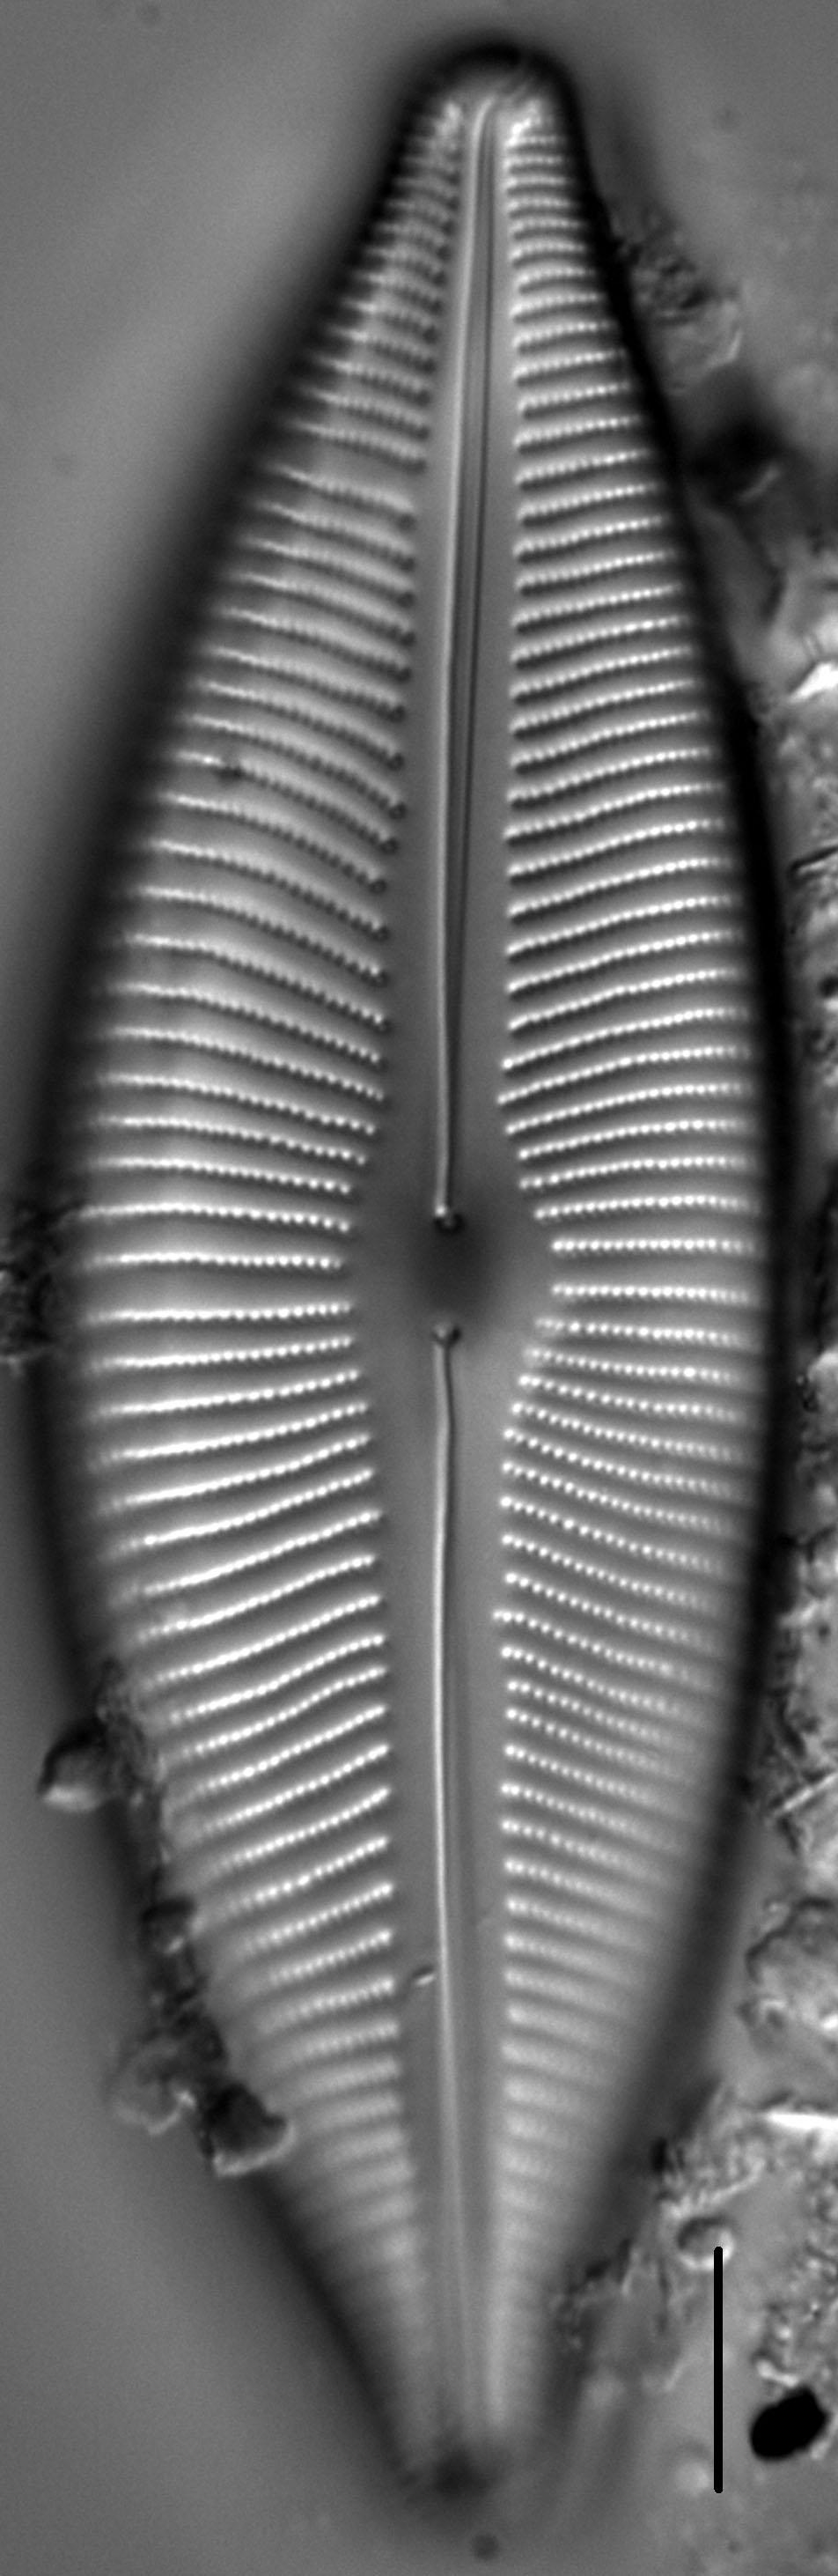 Cymboinaequalis2